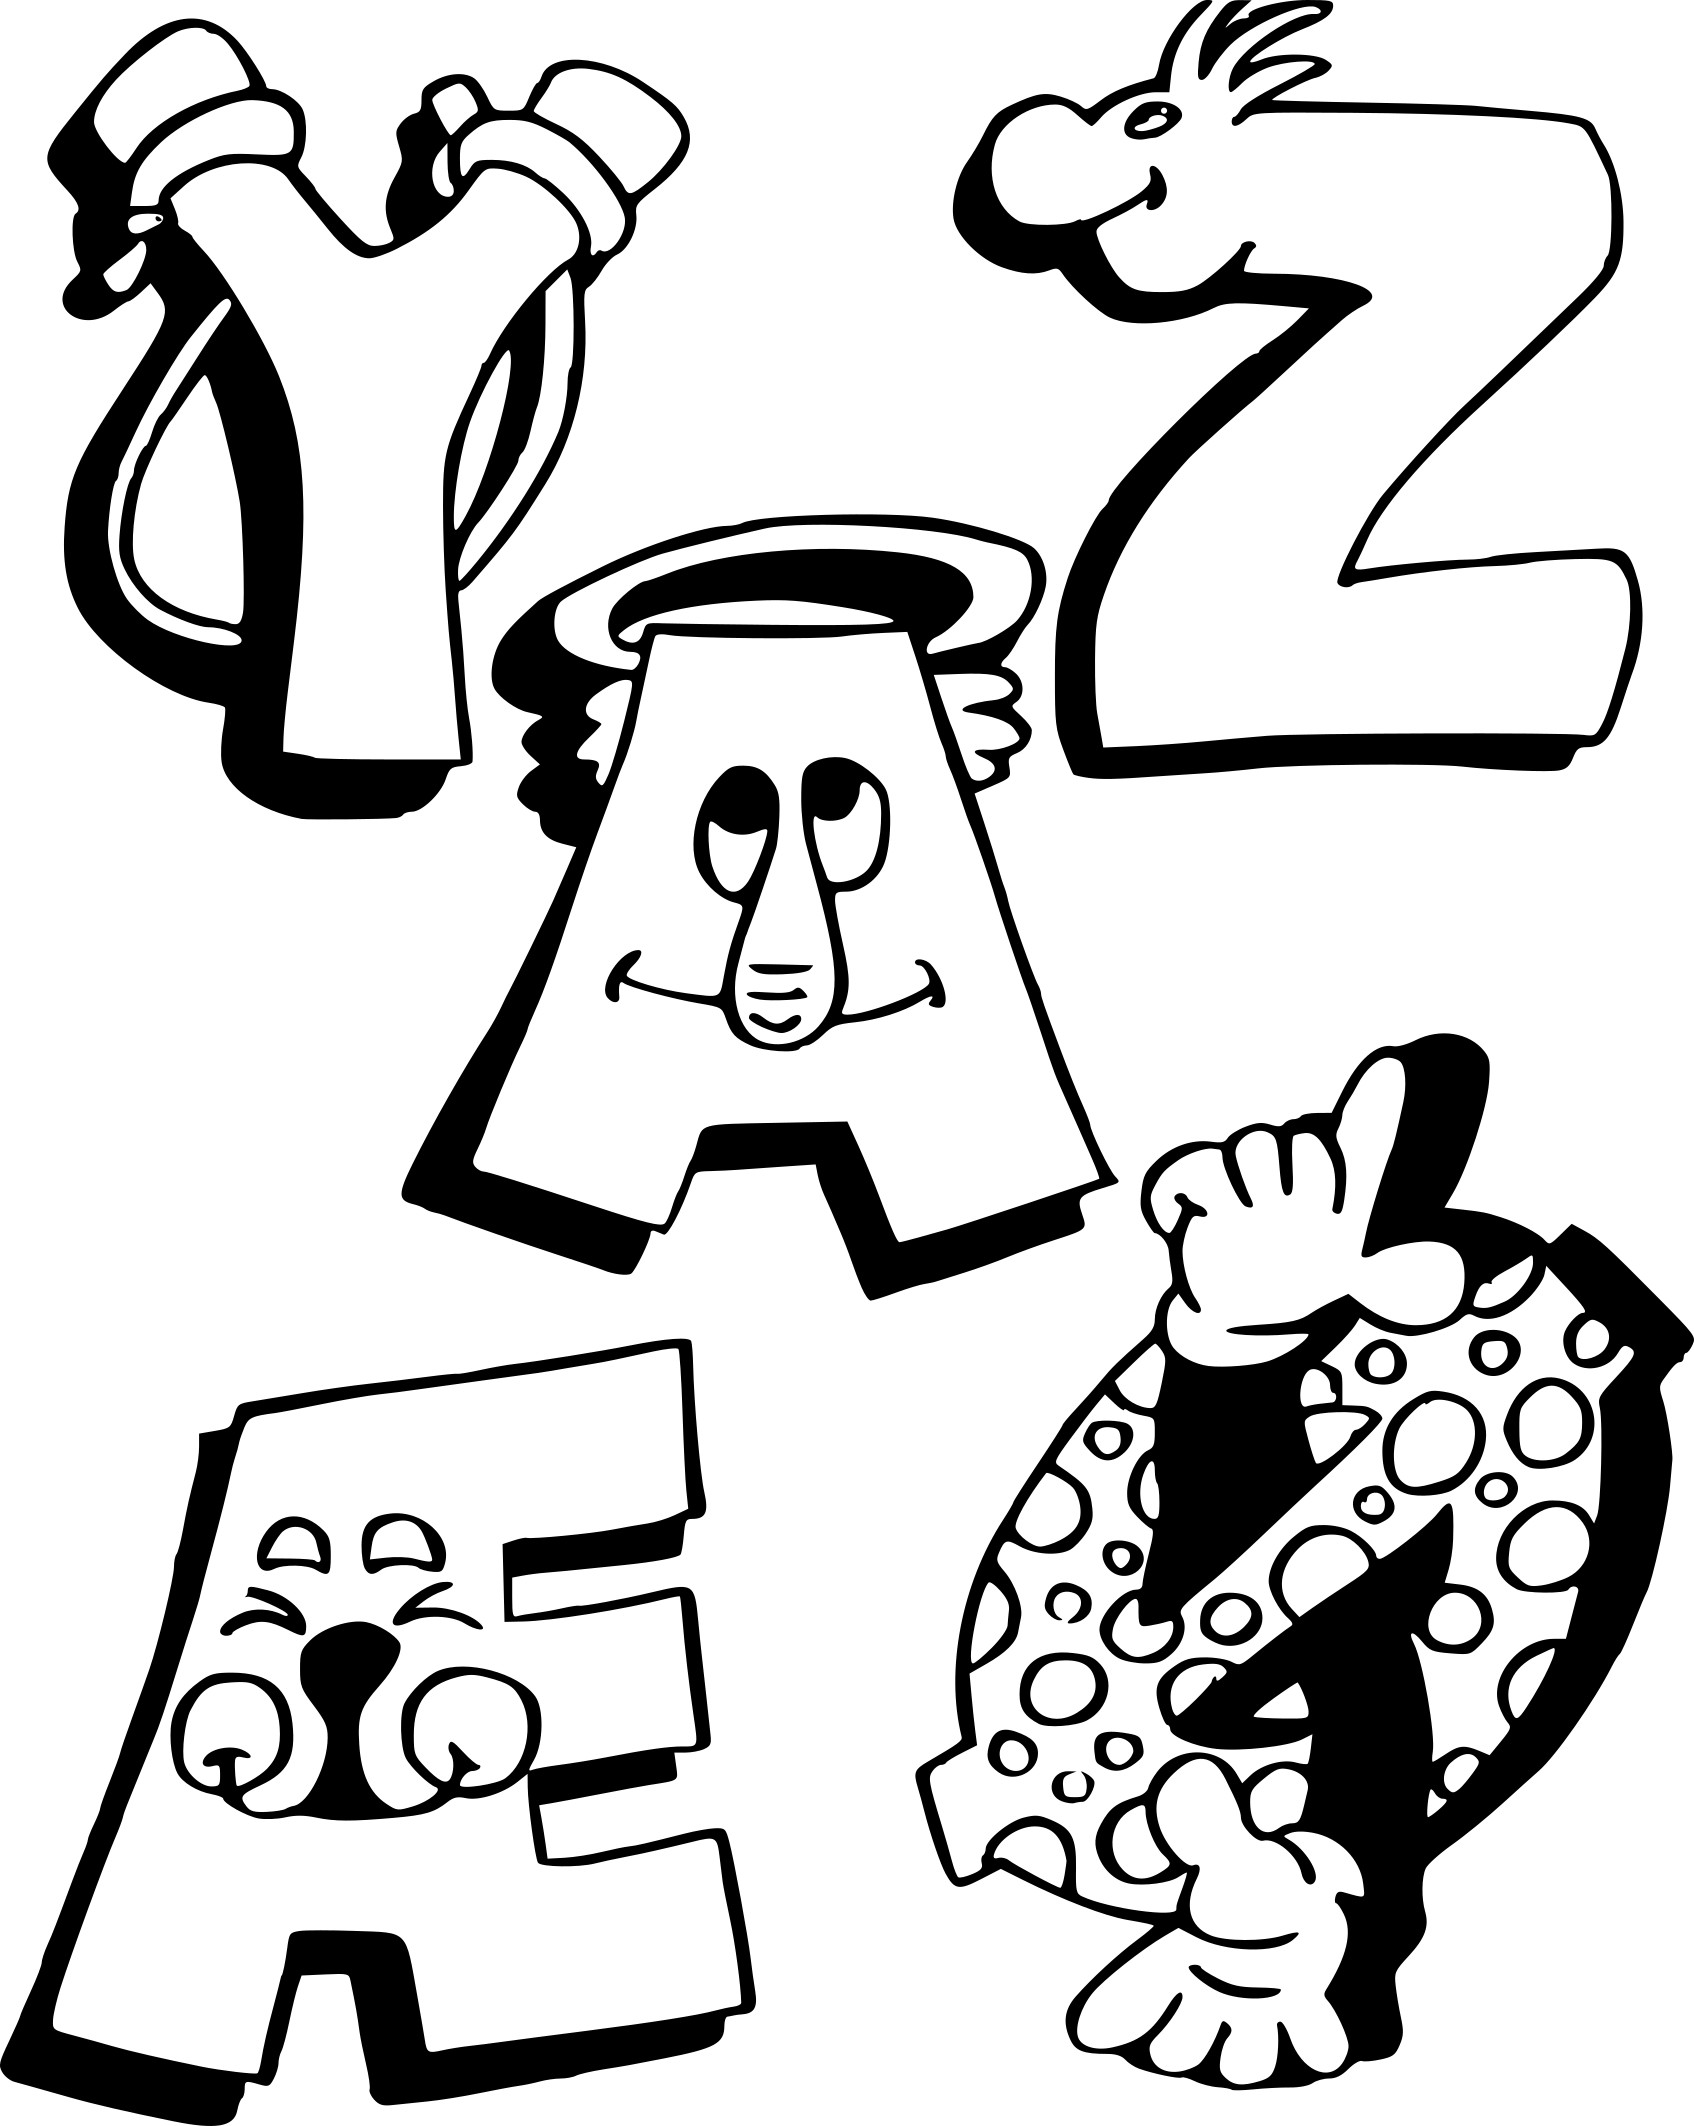 Coloriage alphabet rigolo à imprimer